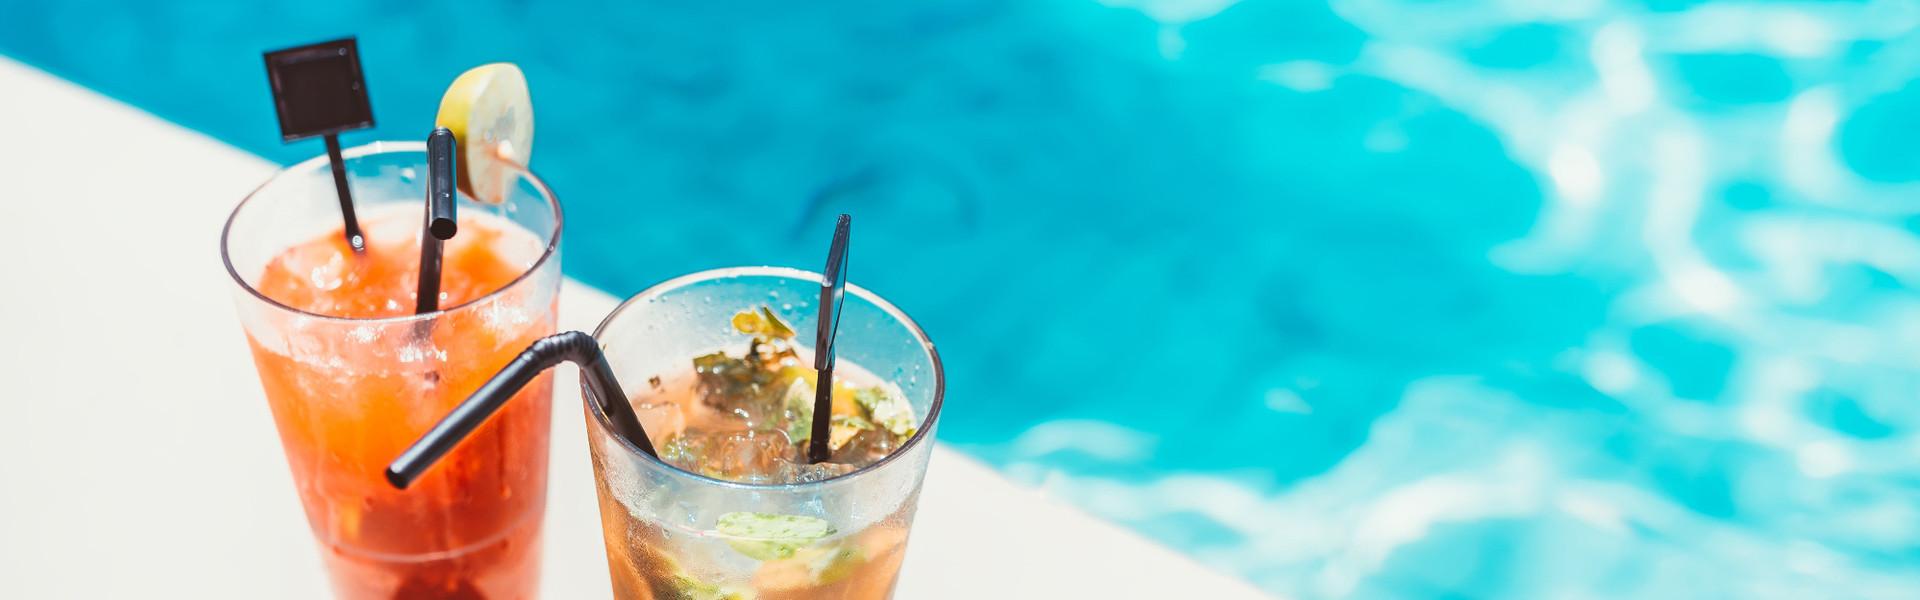 Drinks at Our Pool Bars Near International Drive | Drafts Pool Bar at Westgate Palace Resort | Pool Bars in Orlando Florida 32819